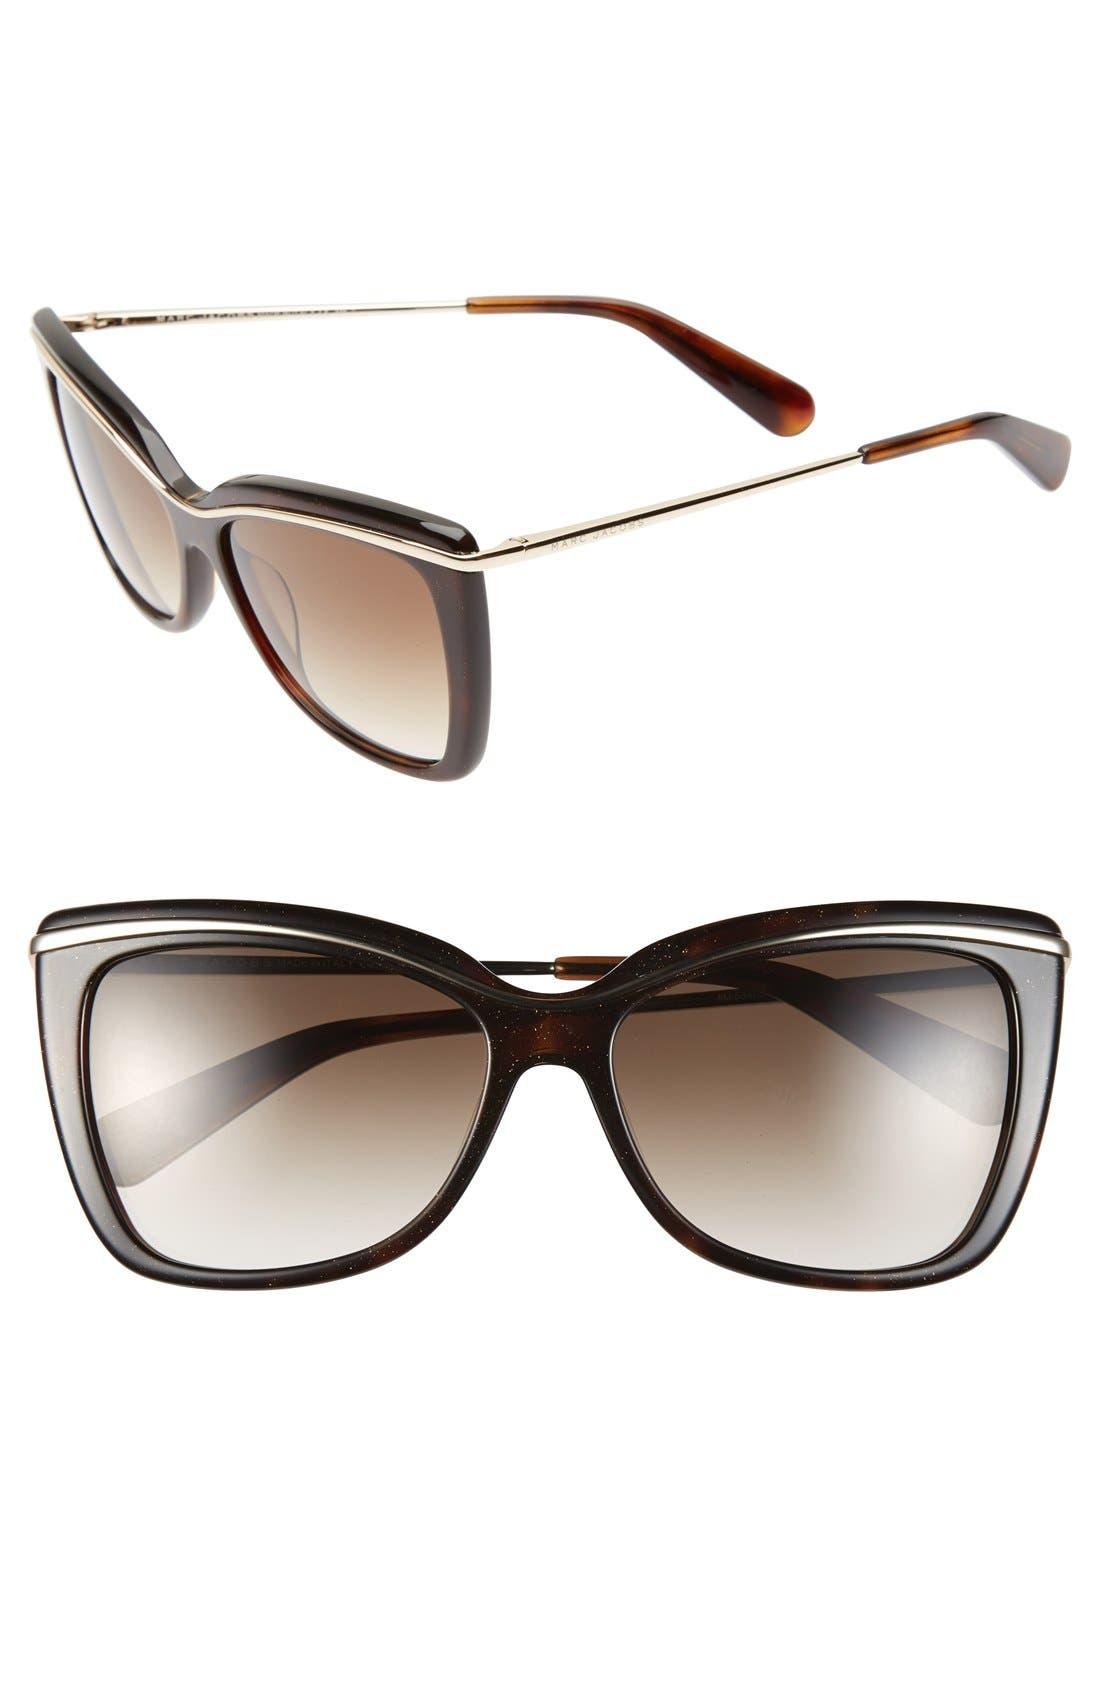 Main Image - MARC JACOBS 56mm Cat Eye Sunglasses